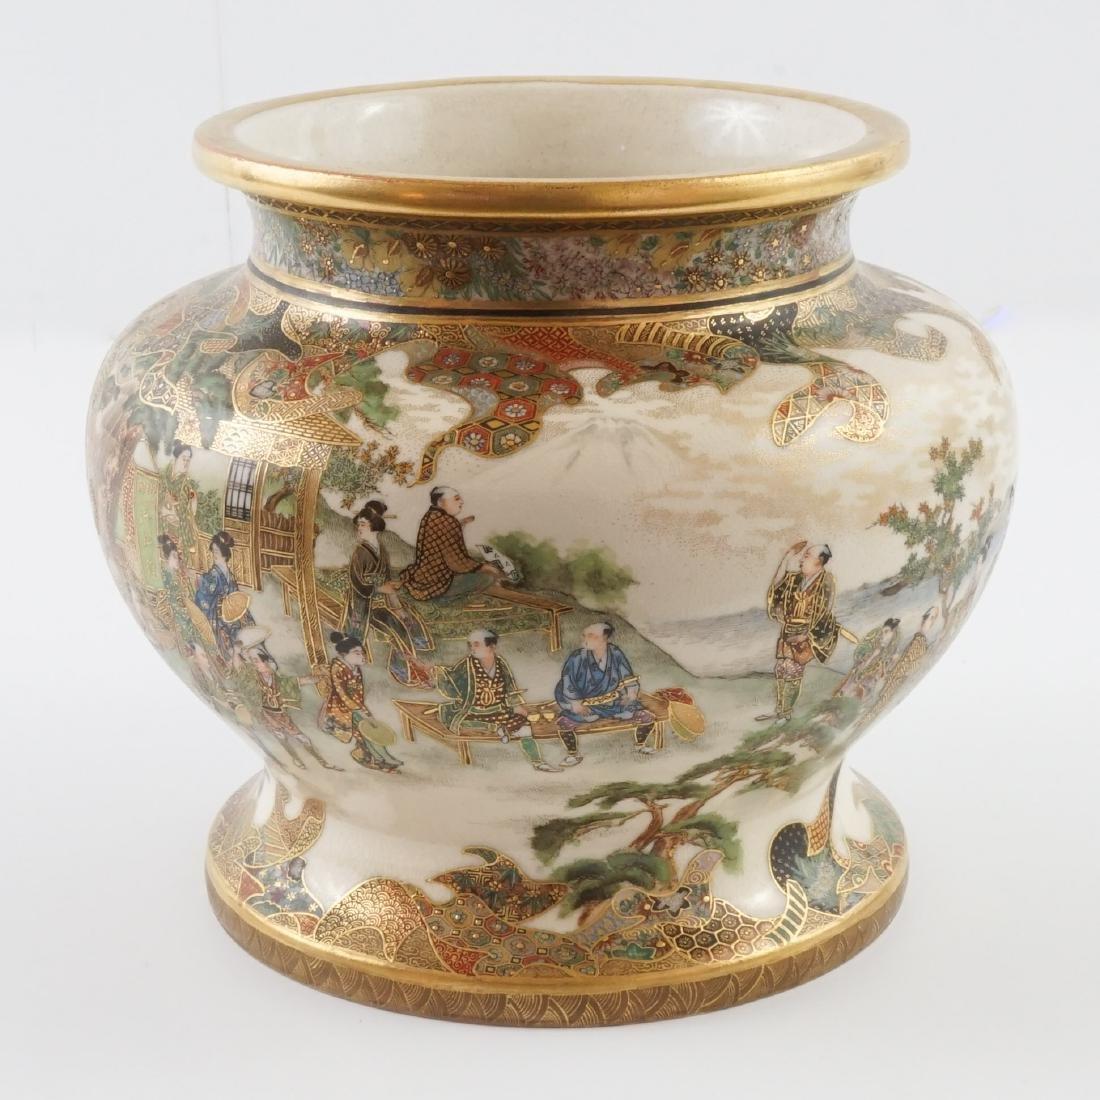 Antique Japanese Ryozan Satauma Jar with Stand - 9